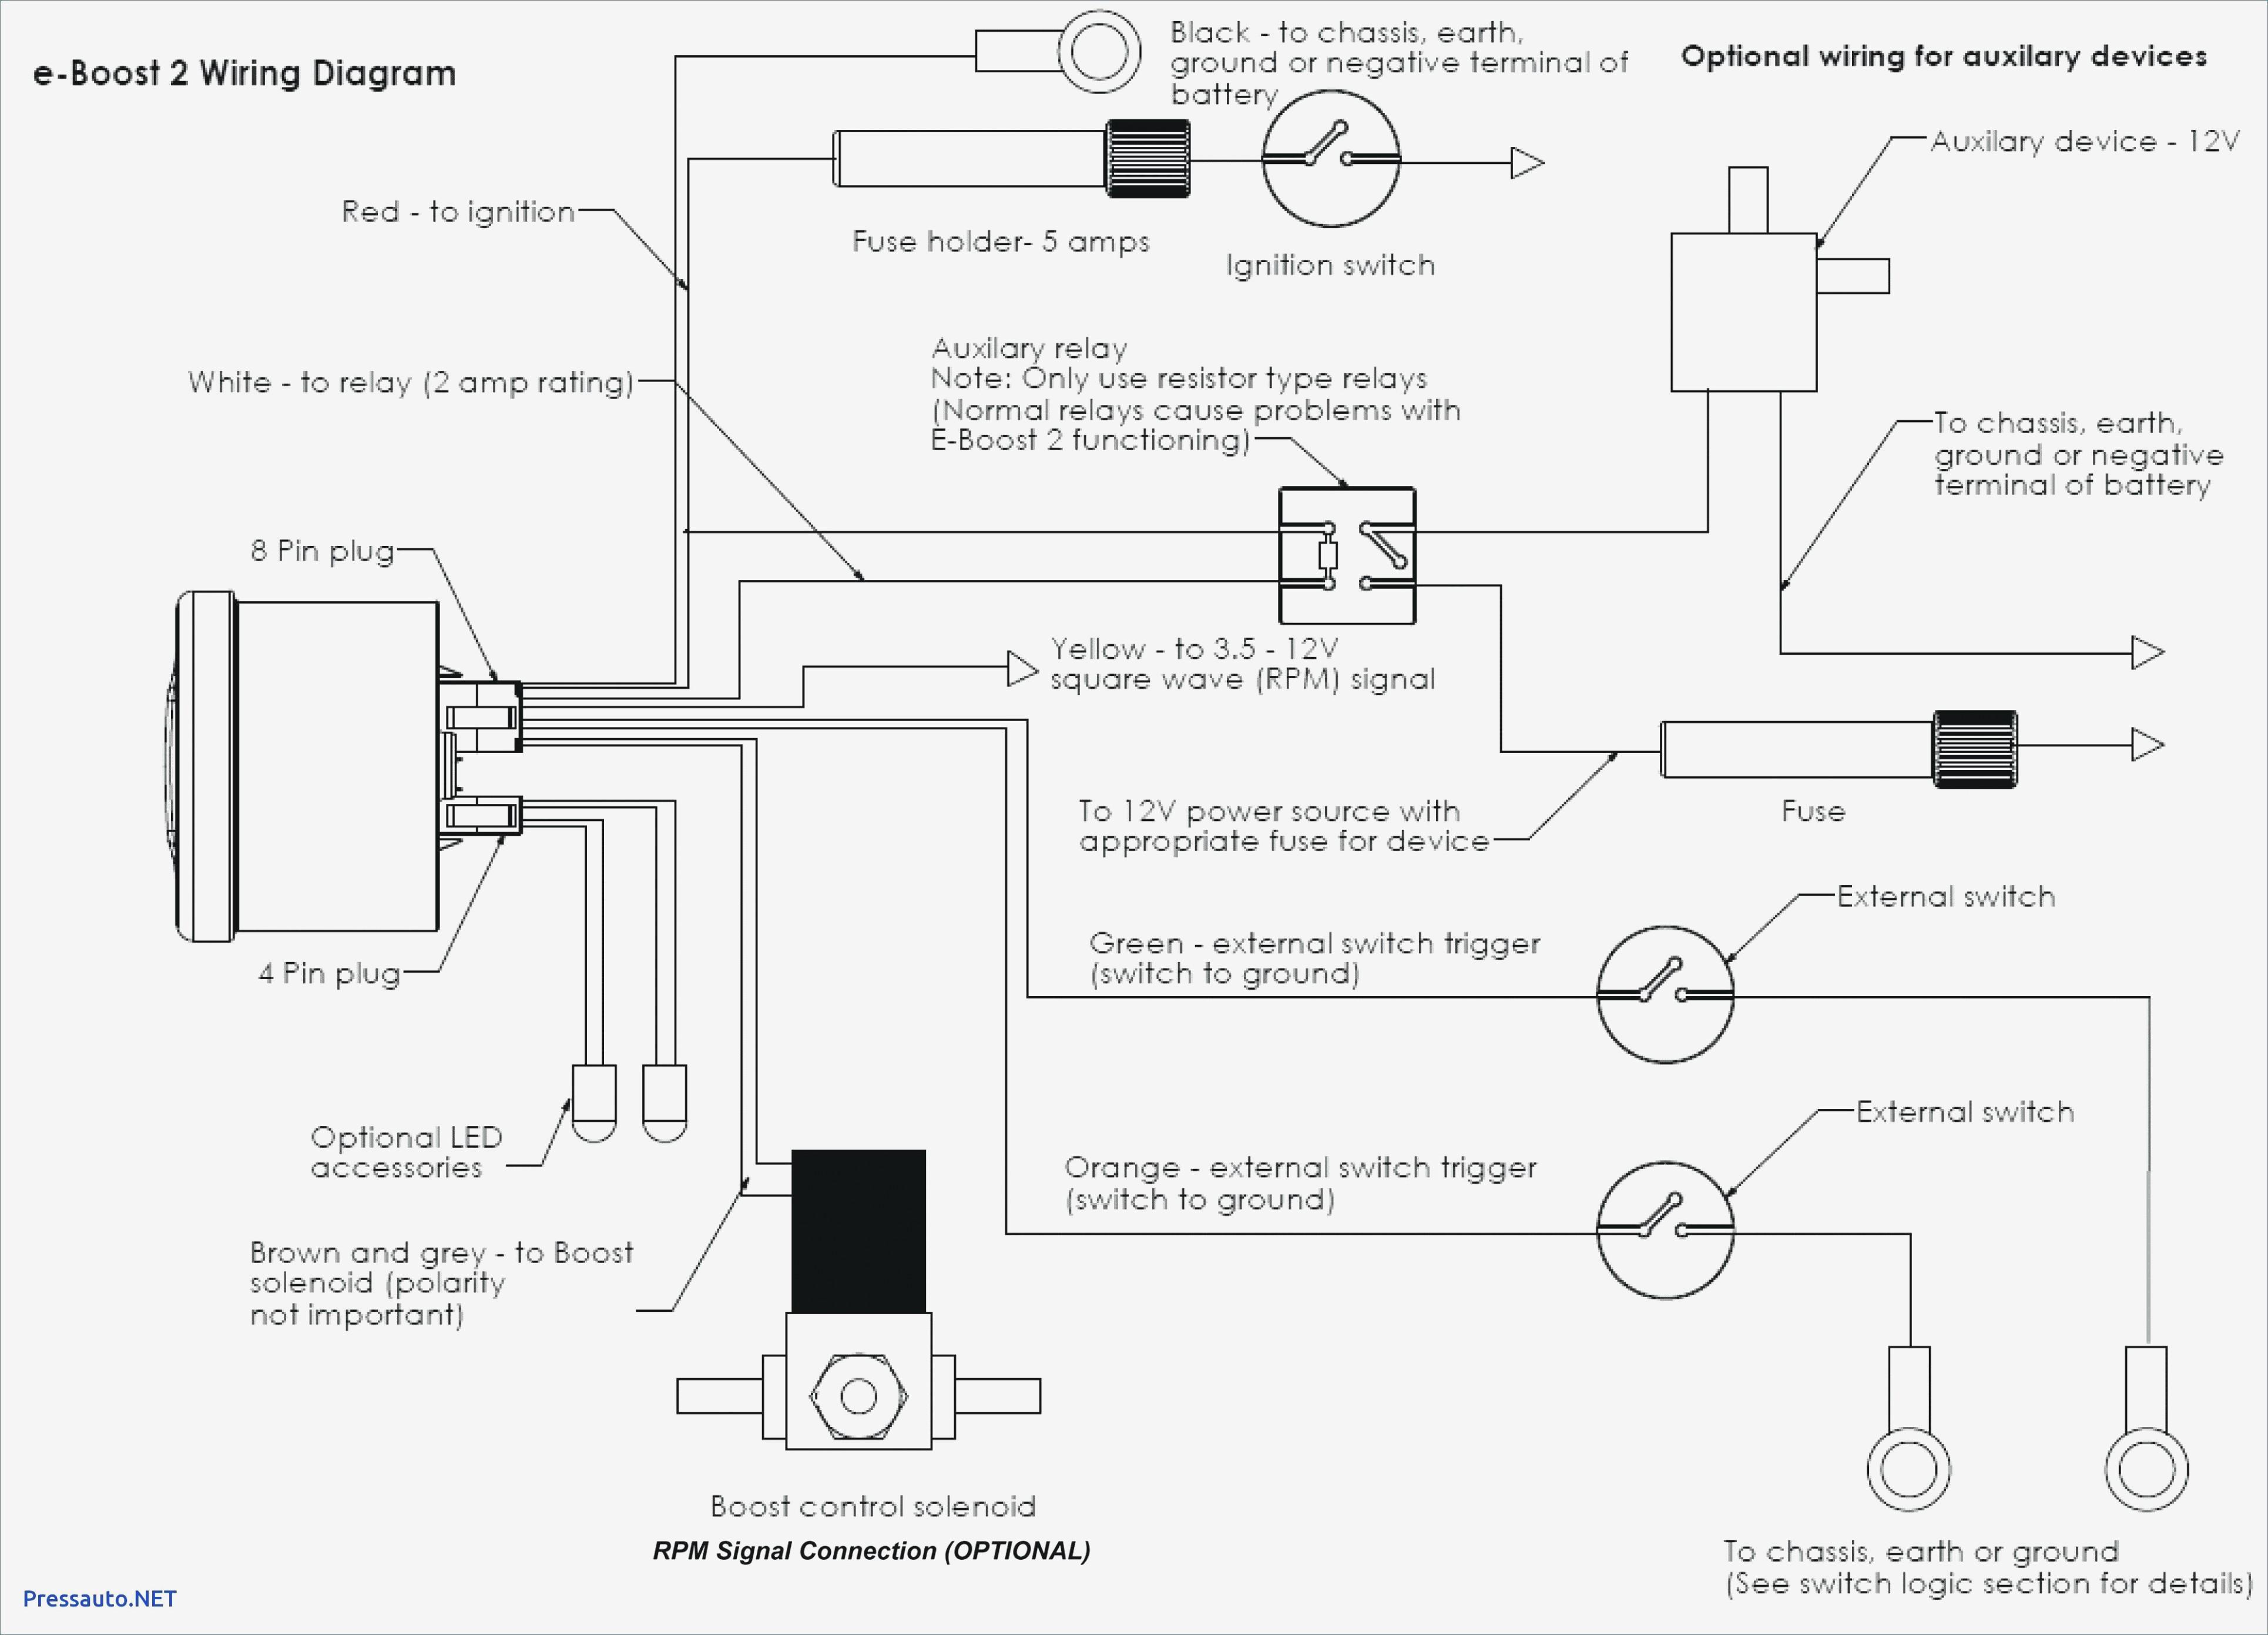 Walk In Freezer Wiring Diagram norlake Walk In Freezer Wiring Diagram Of Walk In Freezer Wiring Diagram